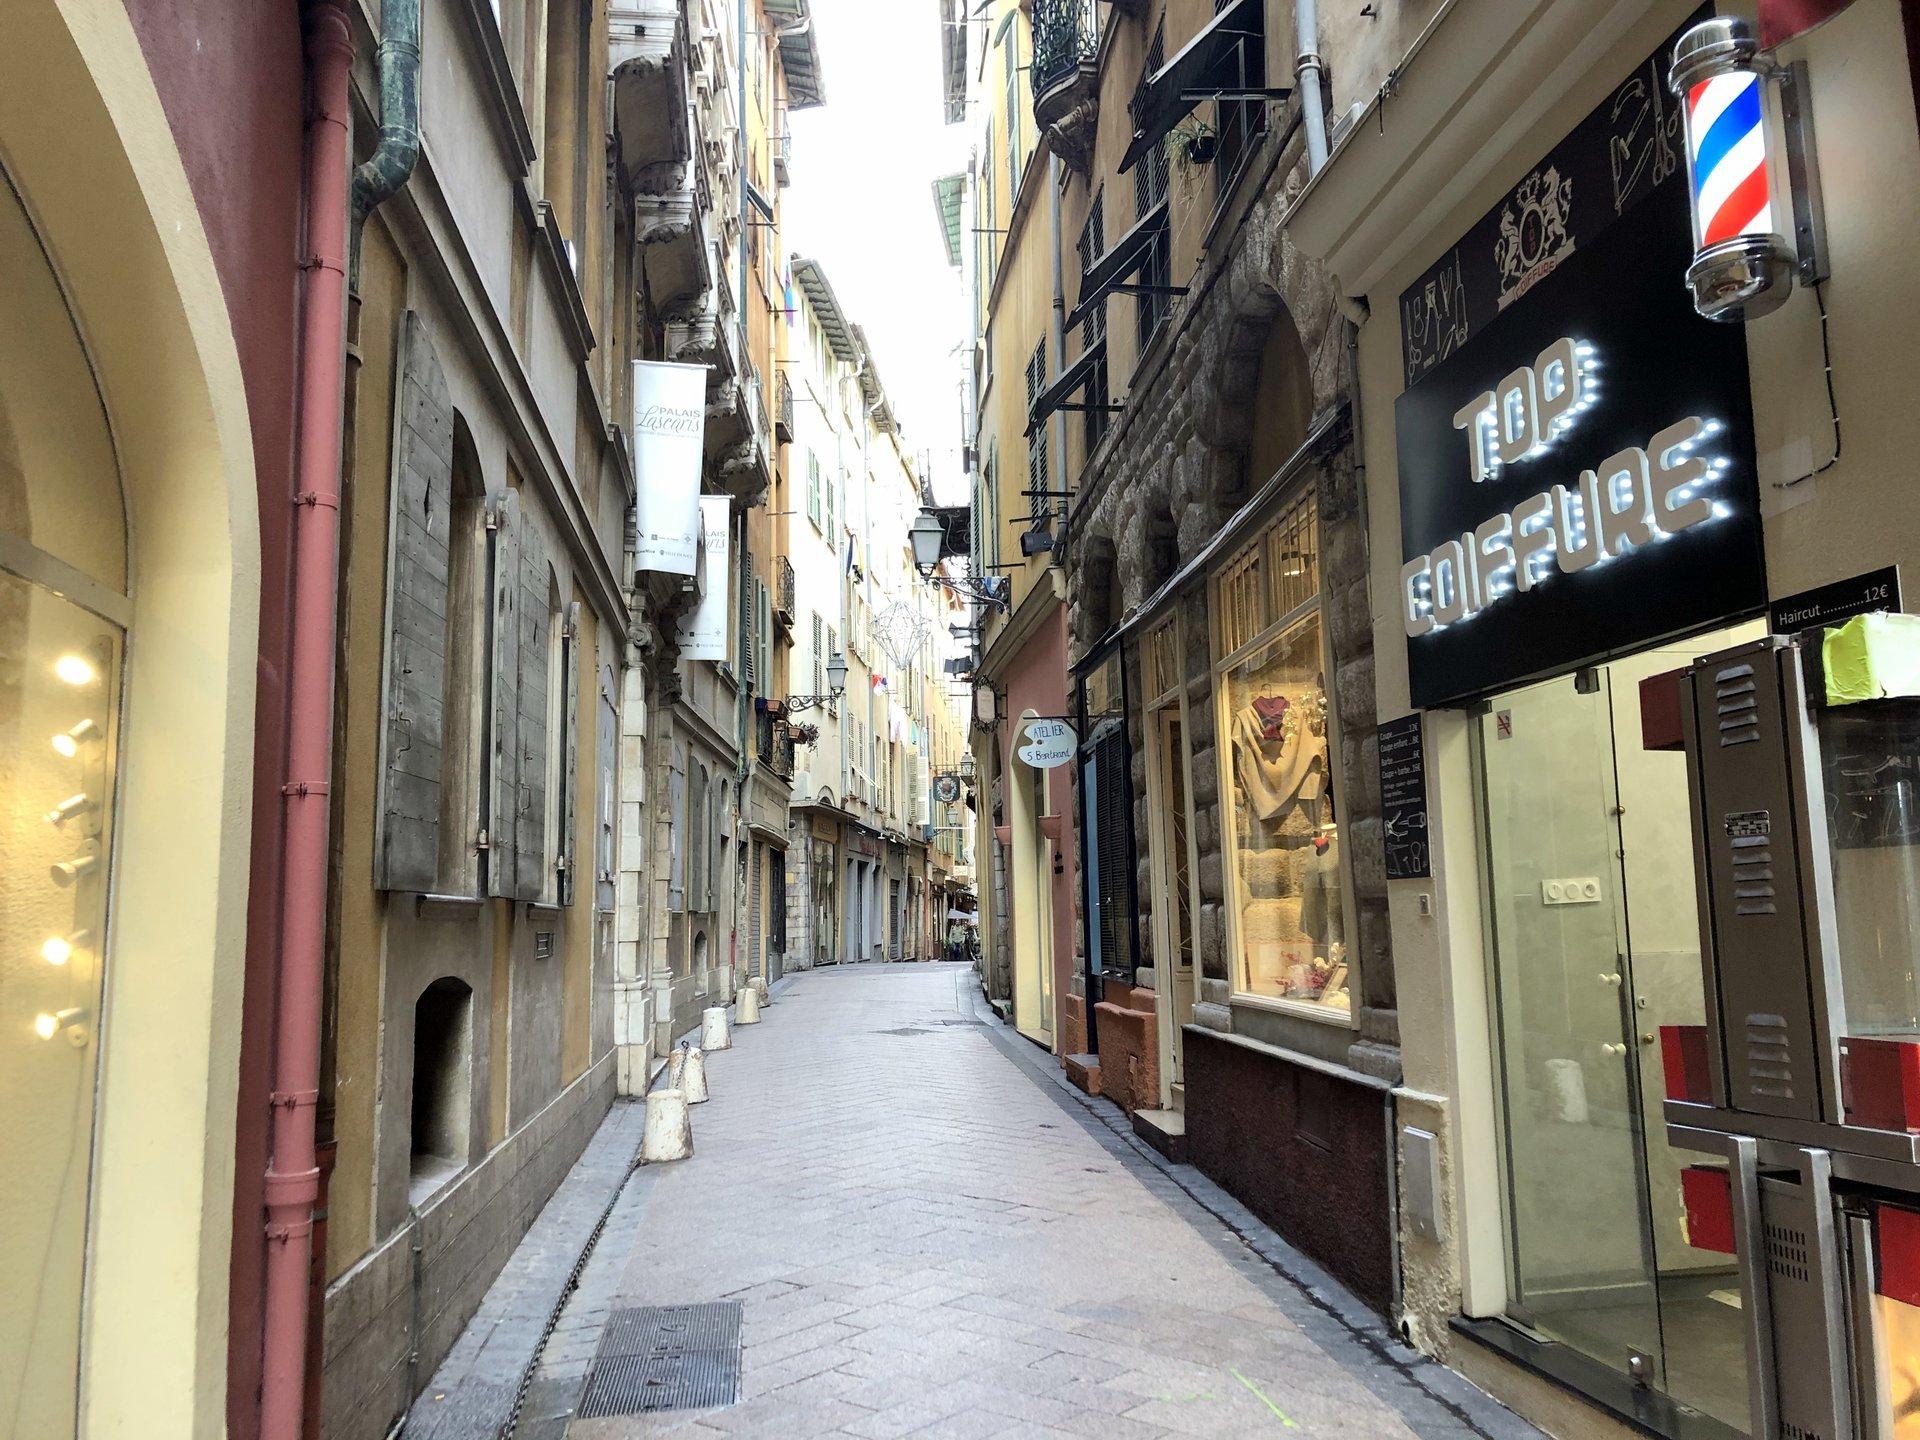 Affitto Appartamento - Nizza (Nice) Vieux Nice